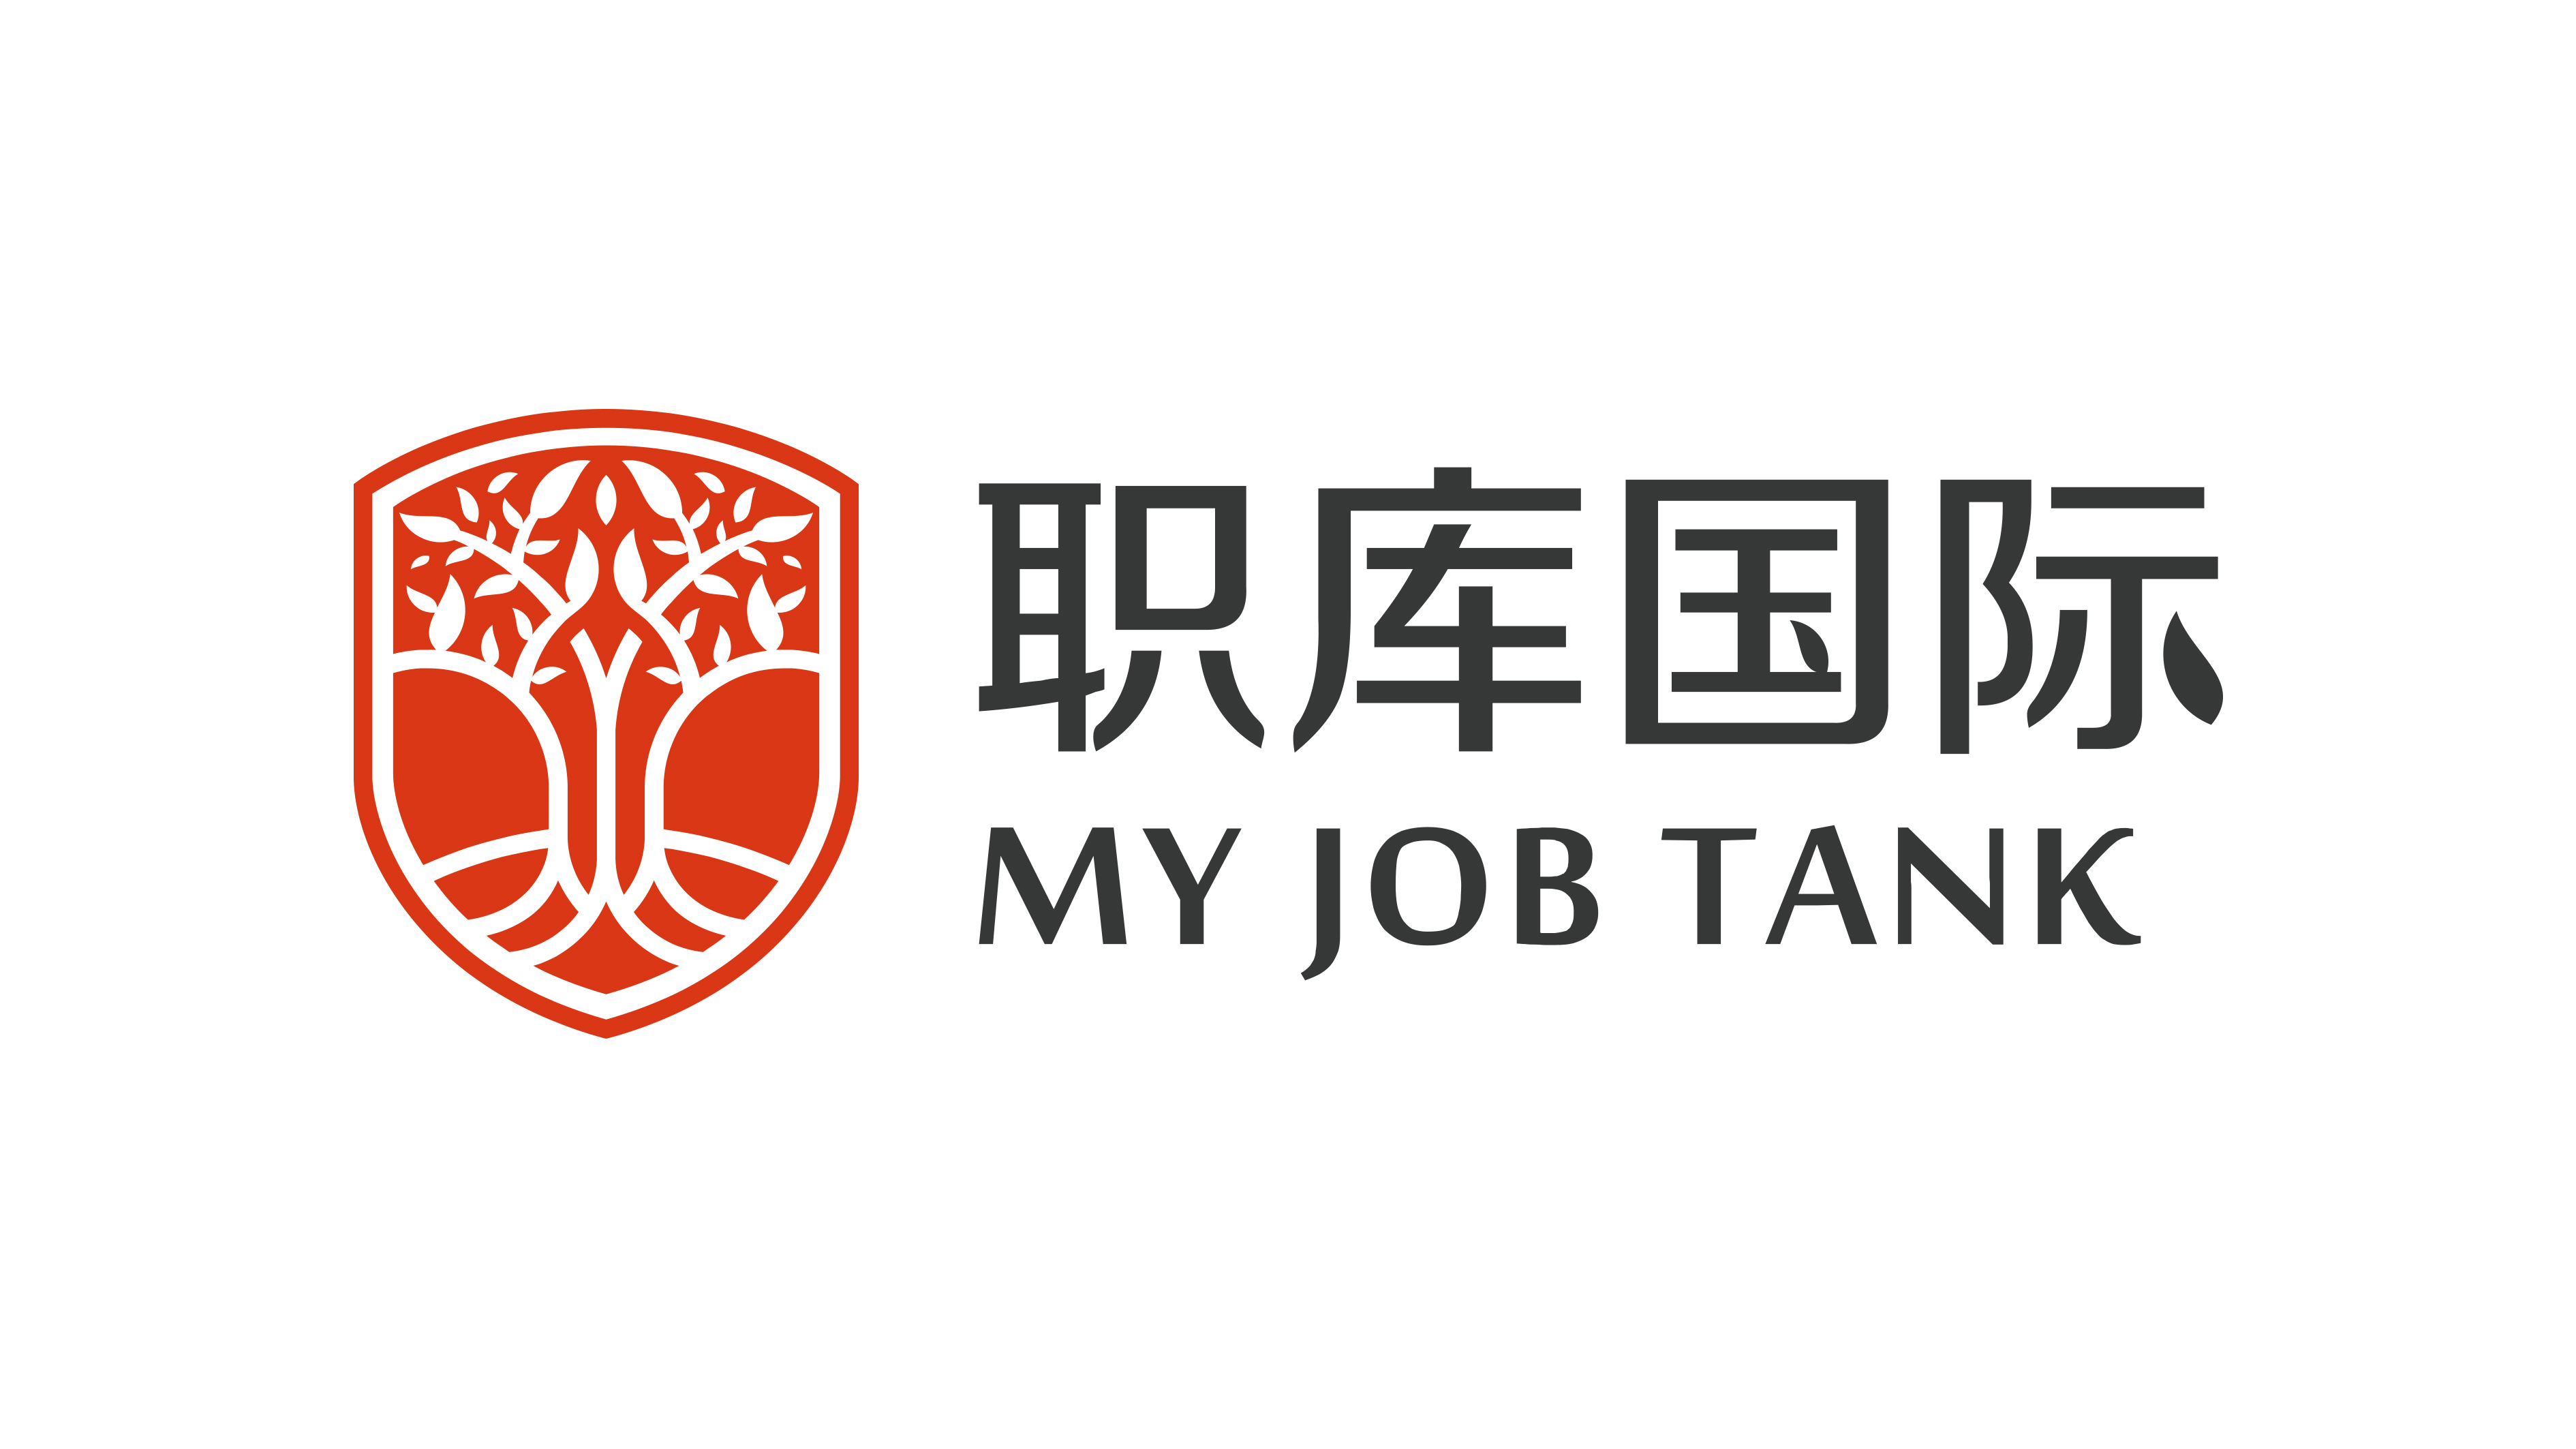 Asset Management Intern - My Job Tank - Career Page